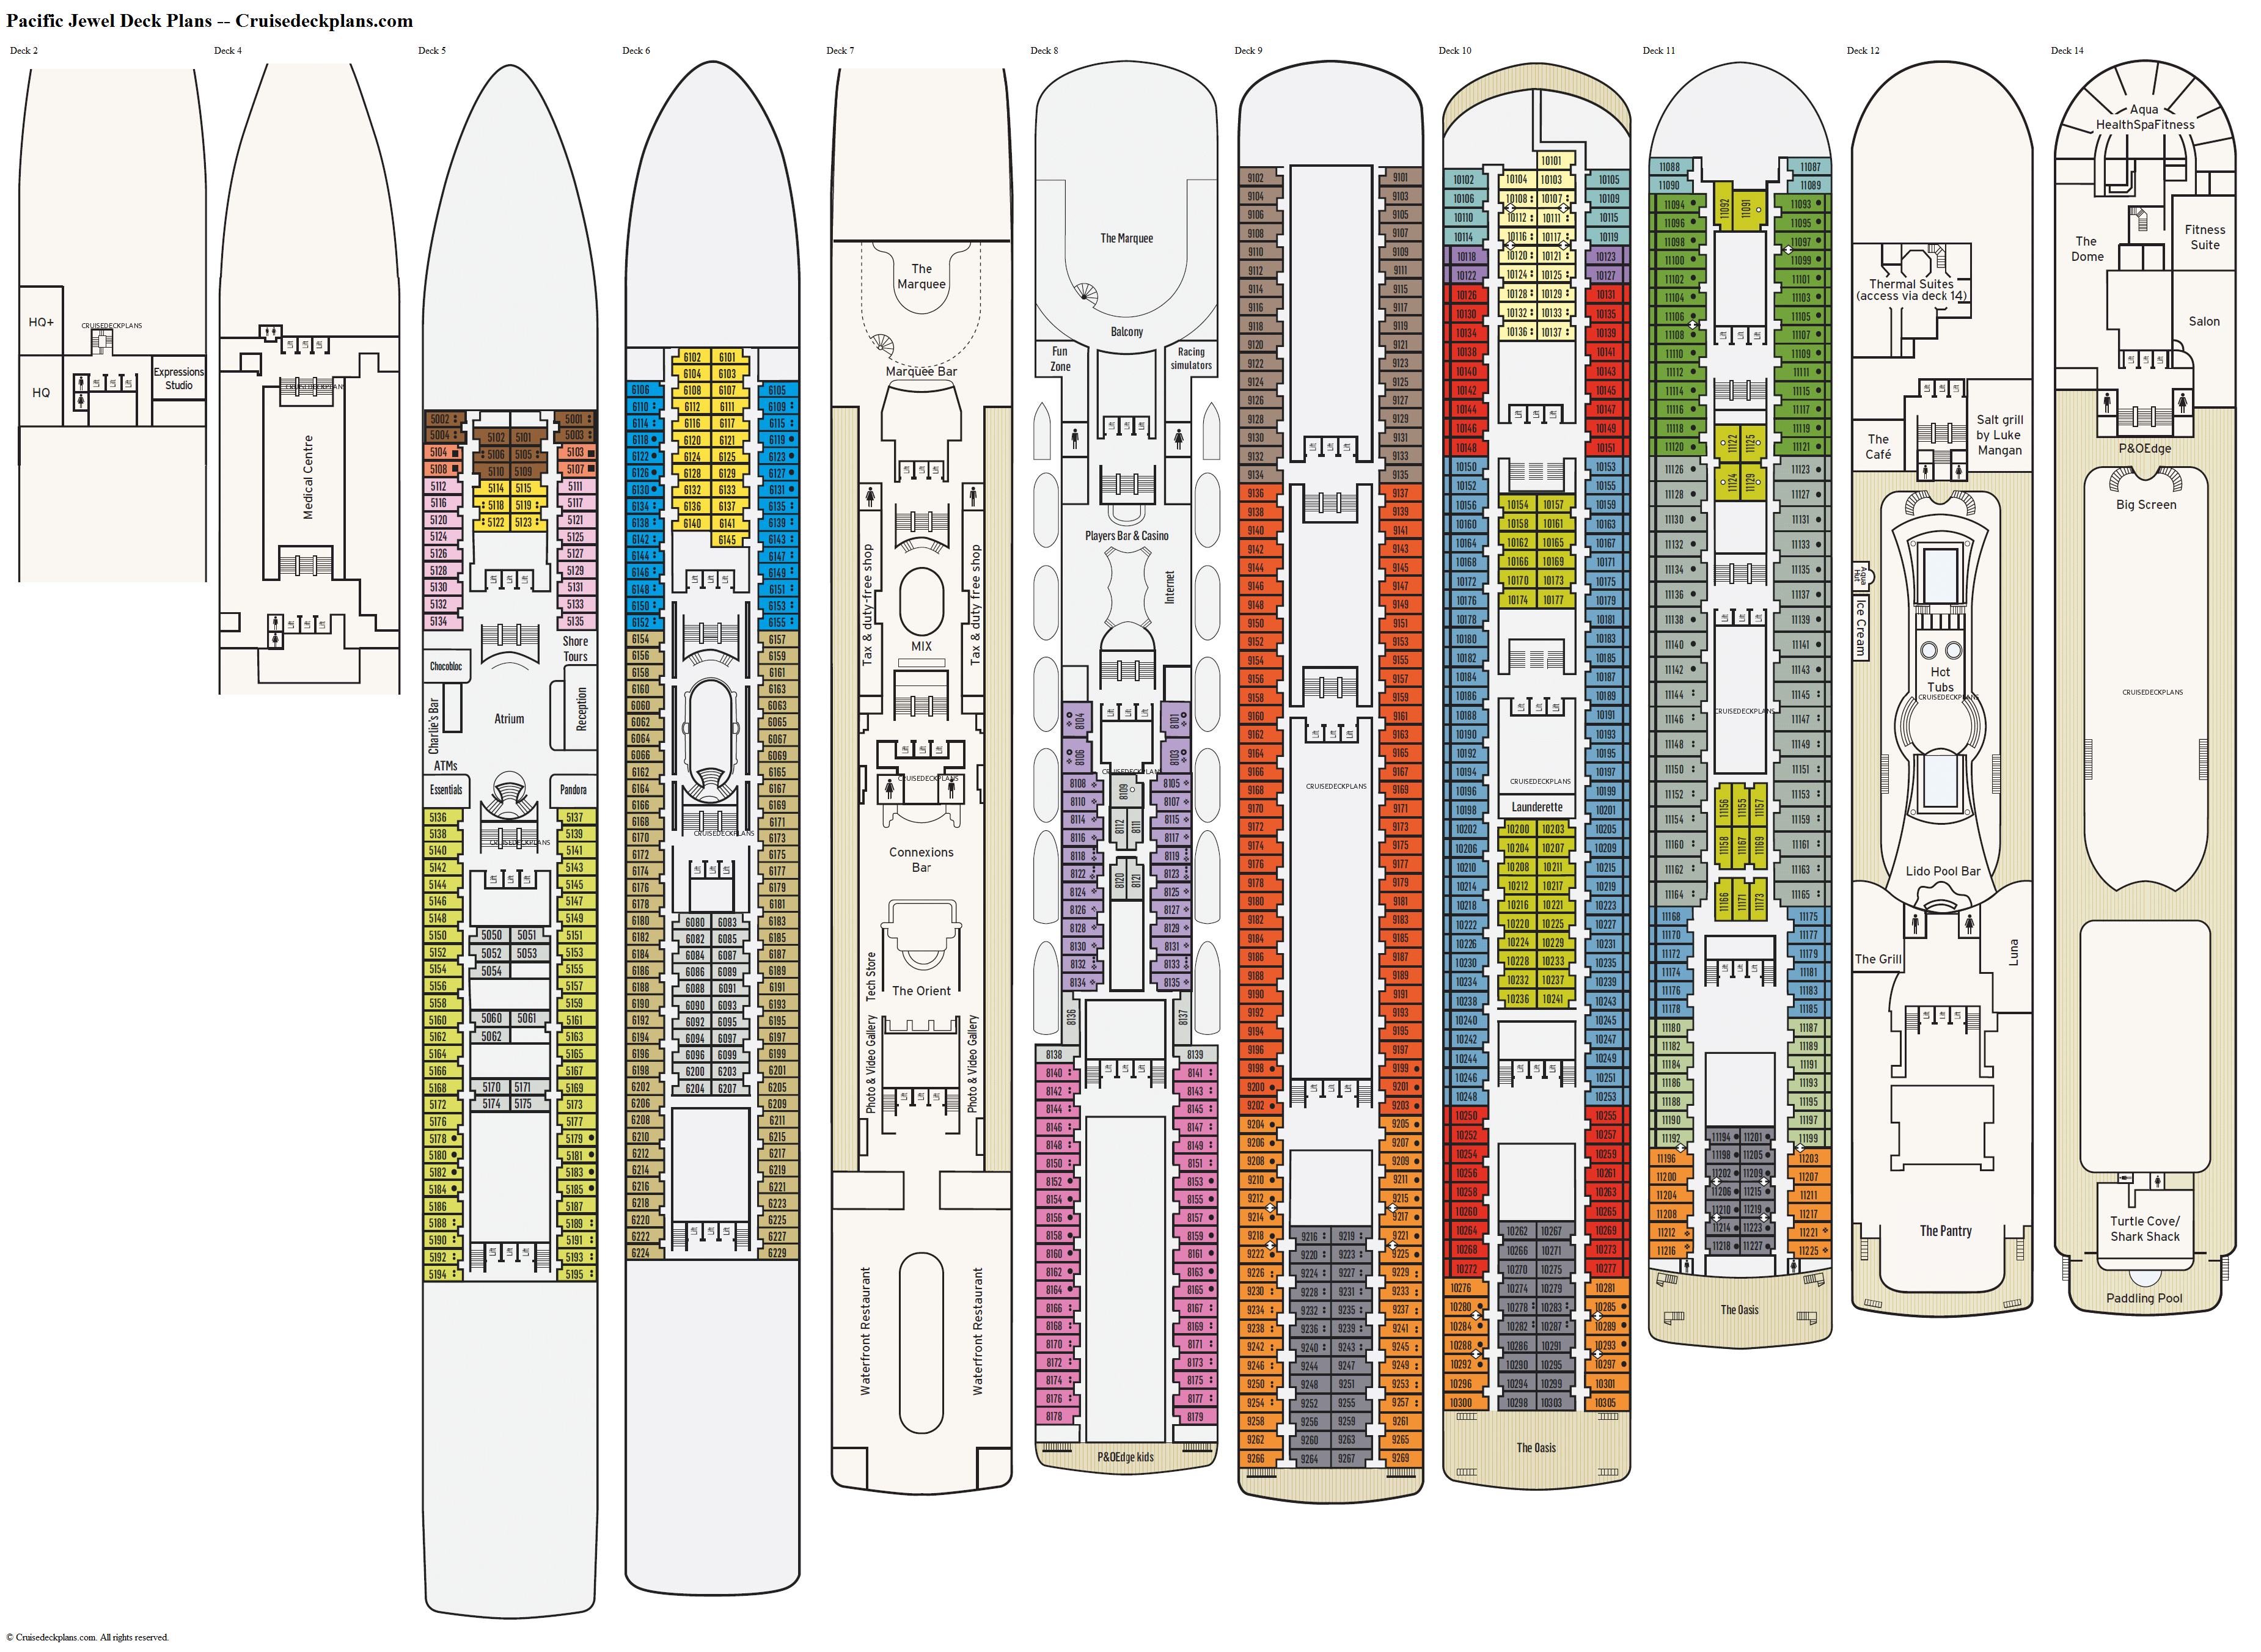 100 8 Norwegian Gem Deck Plan 5 TourGem 6 0 Gif